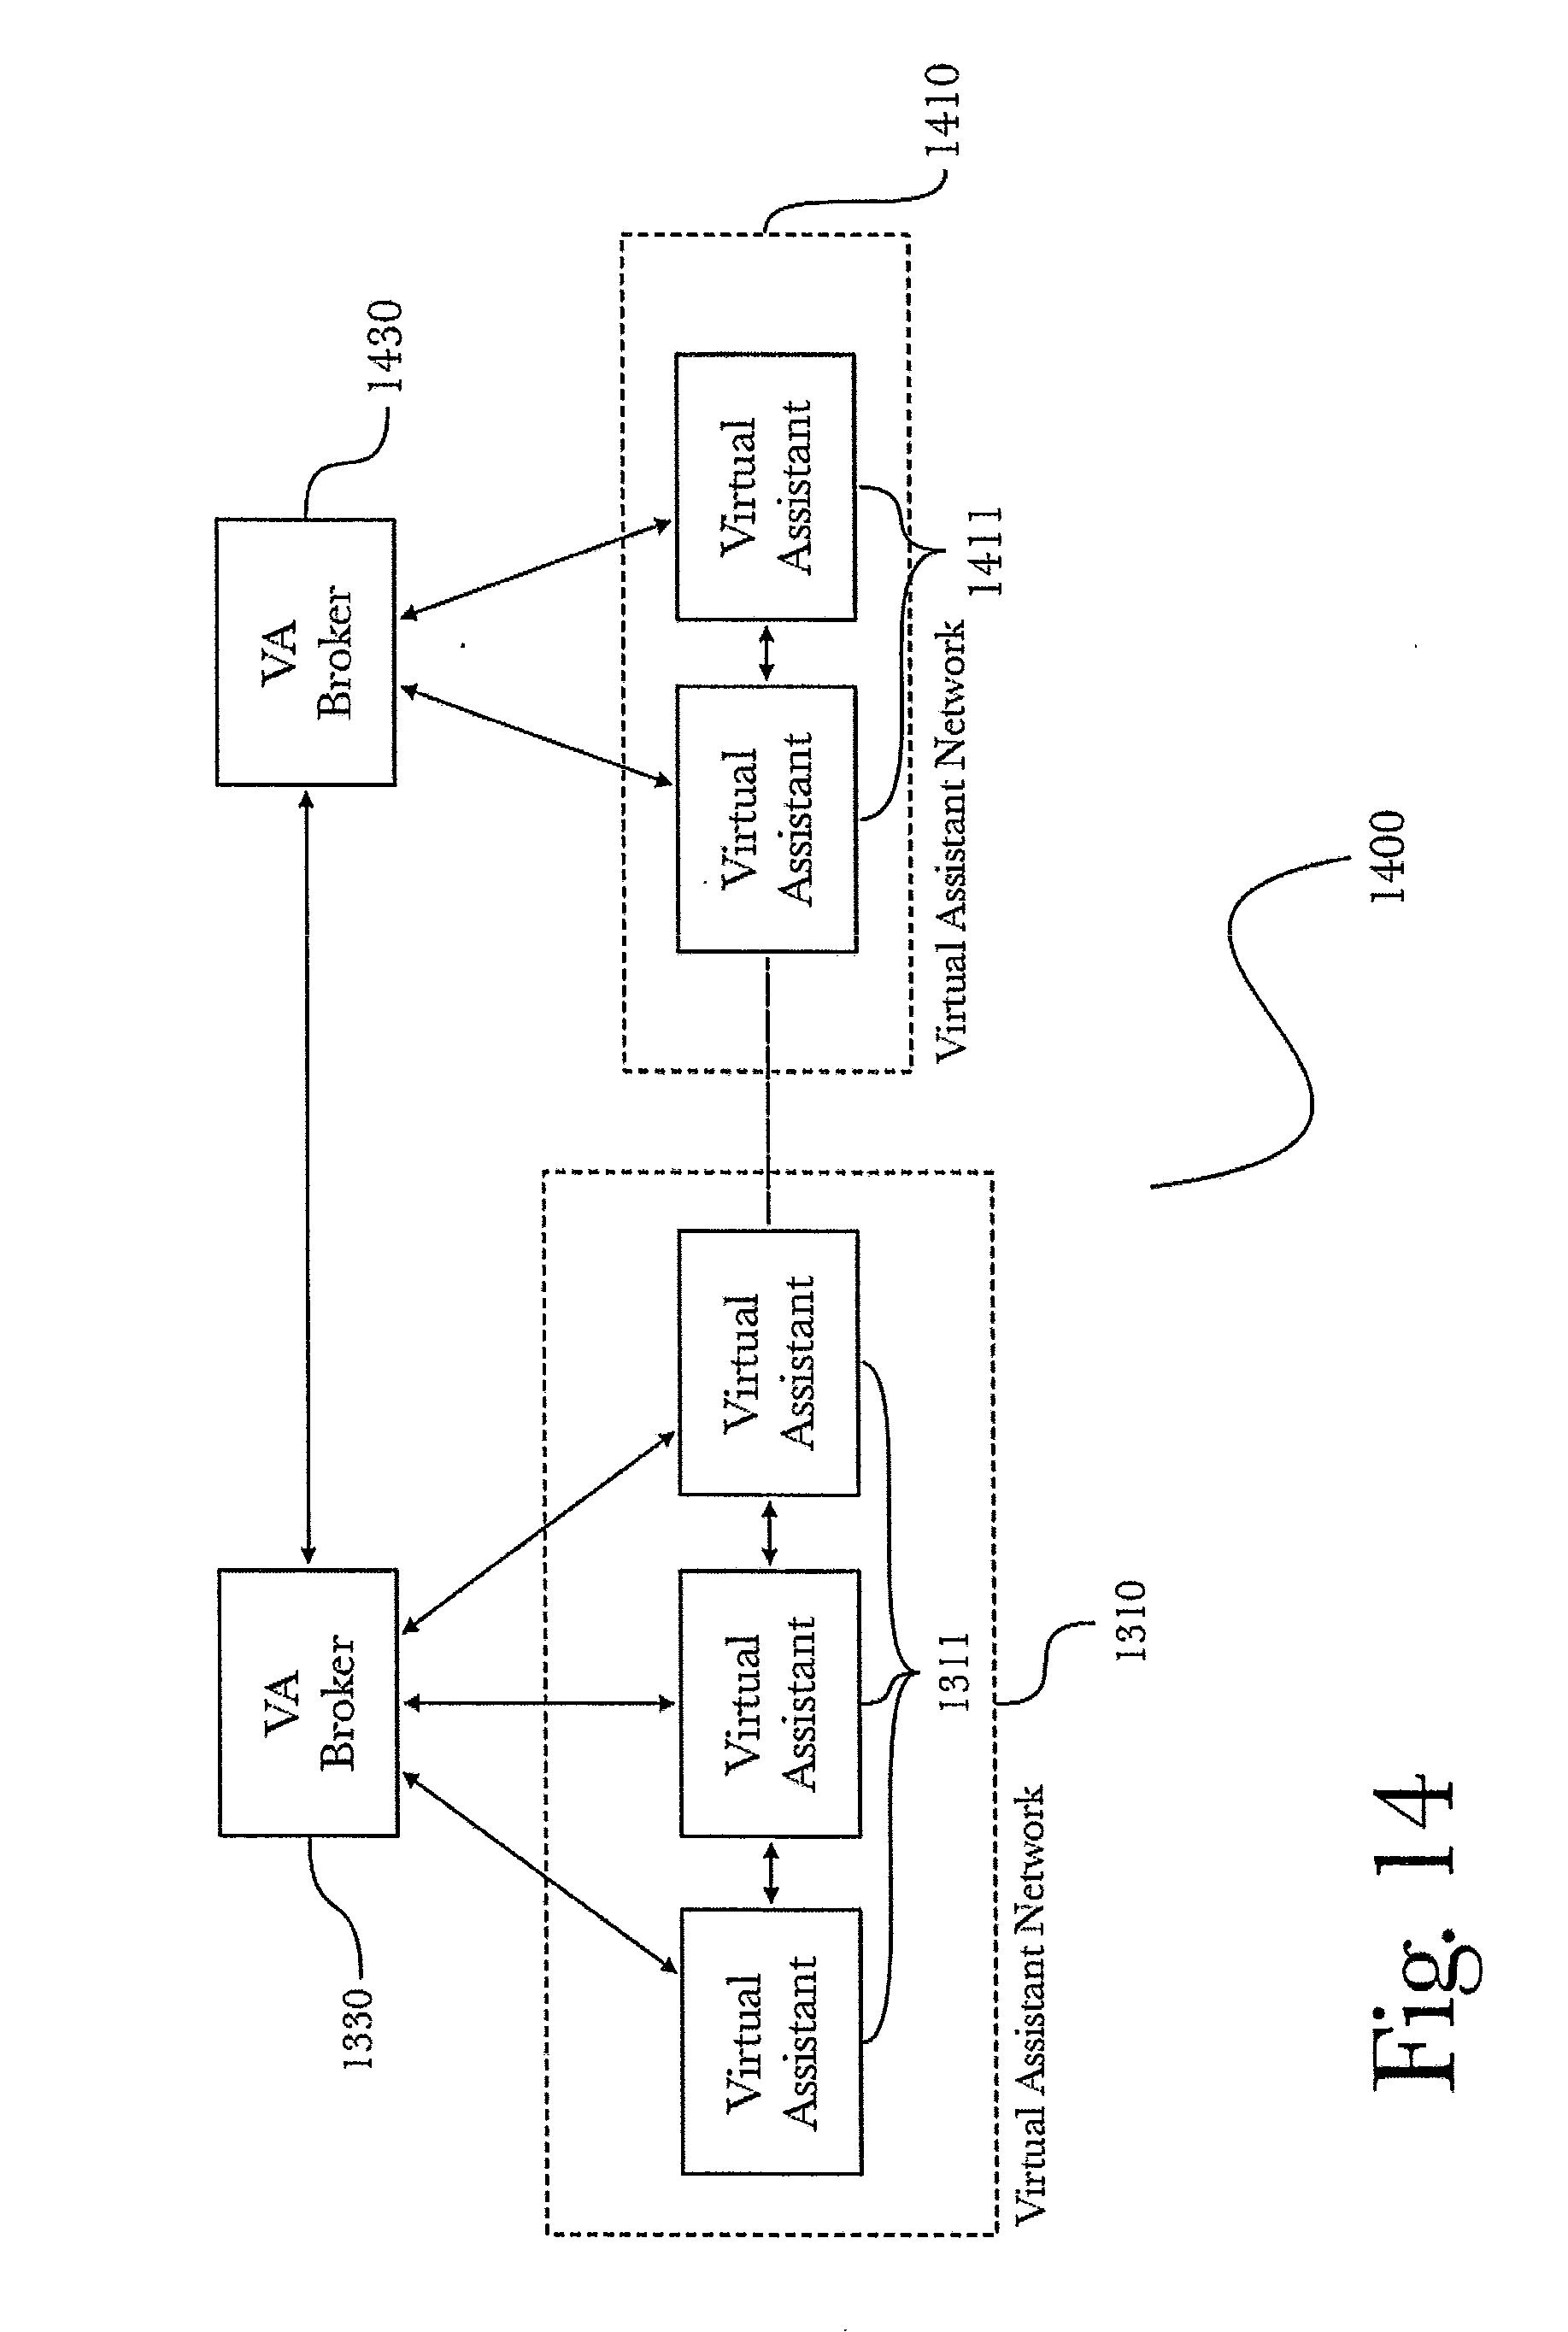 Farmall 656 Wiring Schematic Wiring Diagram Fuse Box